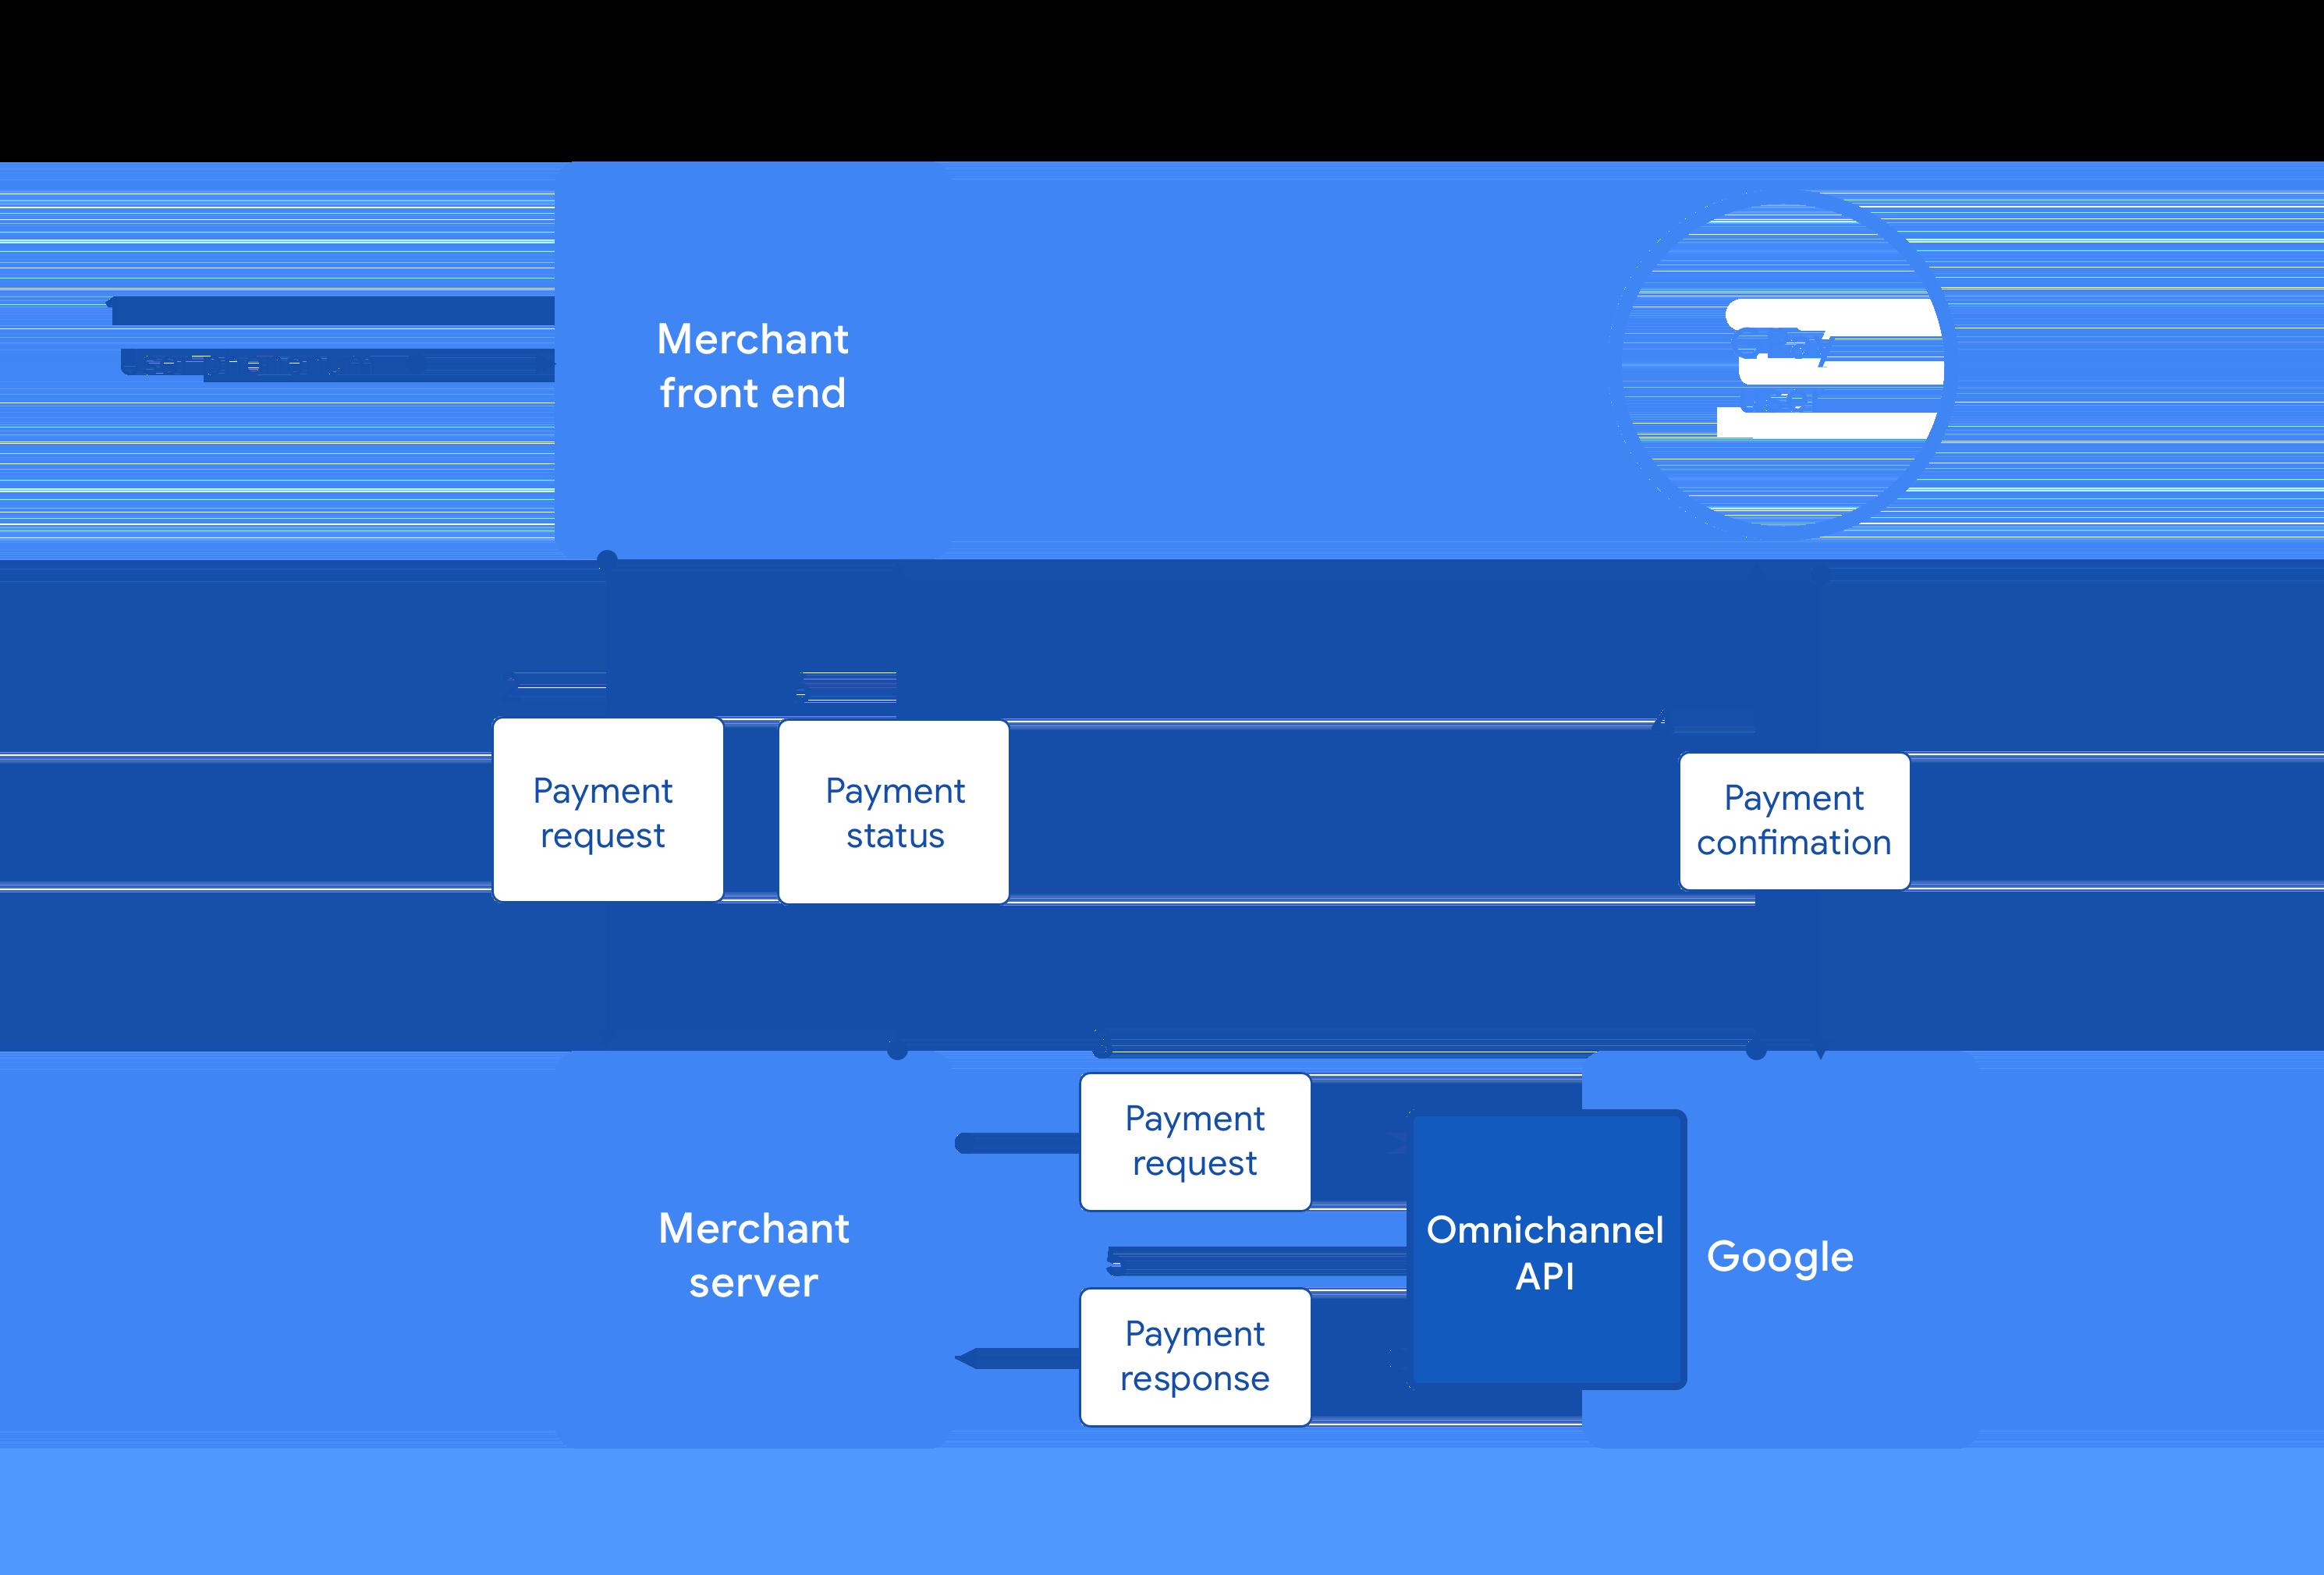 Omnichannel API payment flow